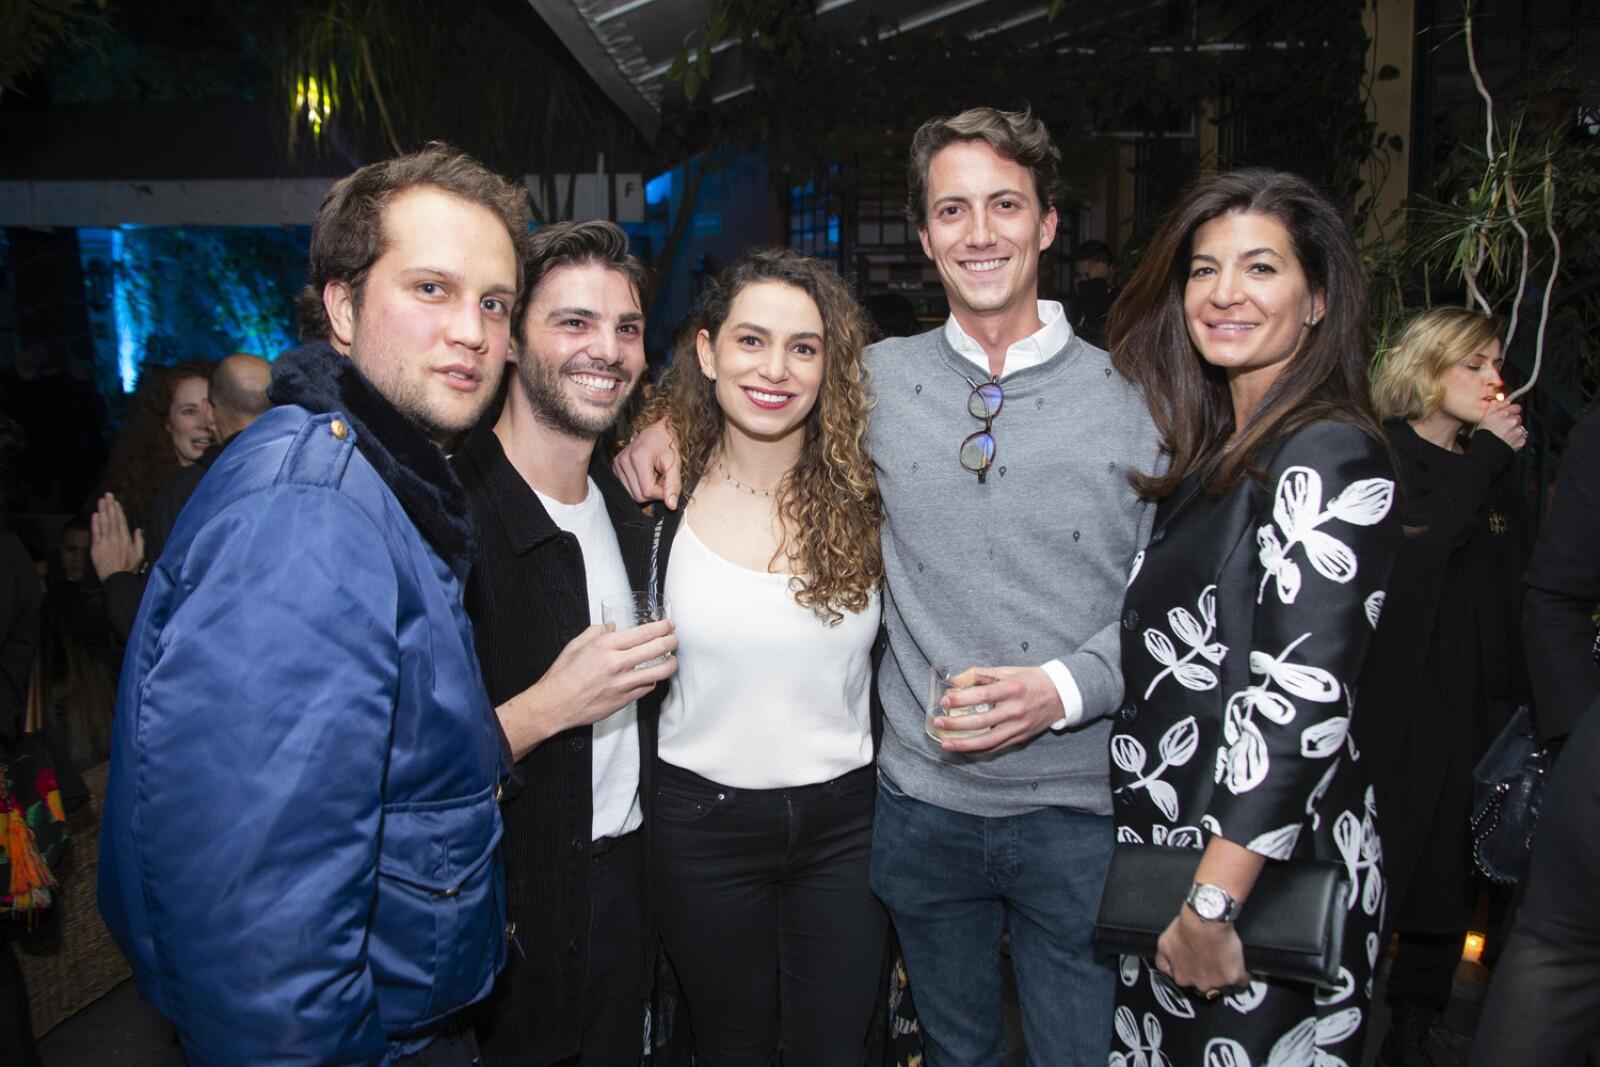 Johan Merguentaler, Marco Rovacchi, Ana Paula Zamacona, Santiago Ortiz Monasterio